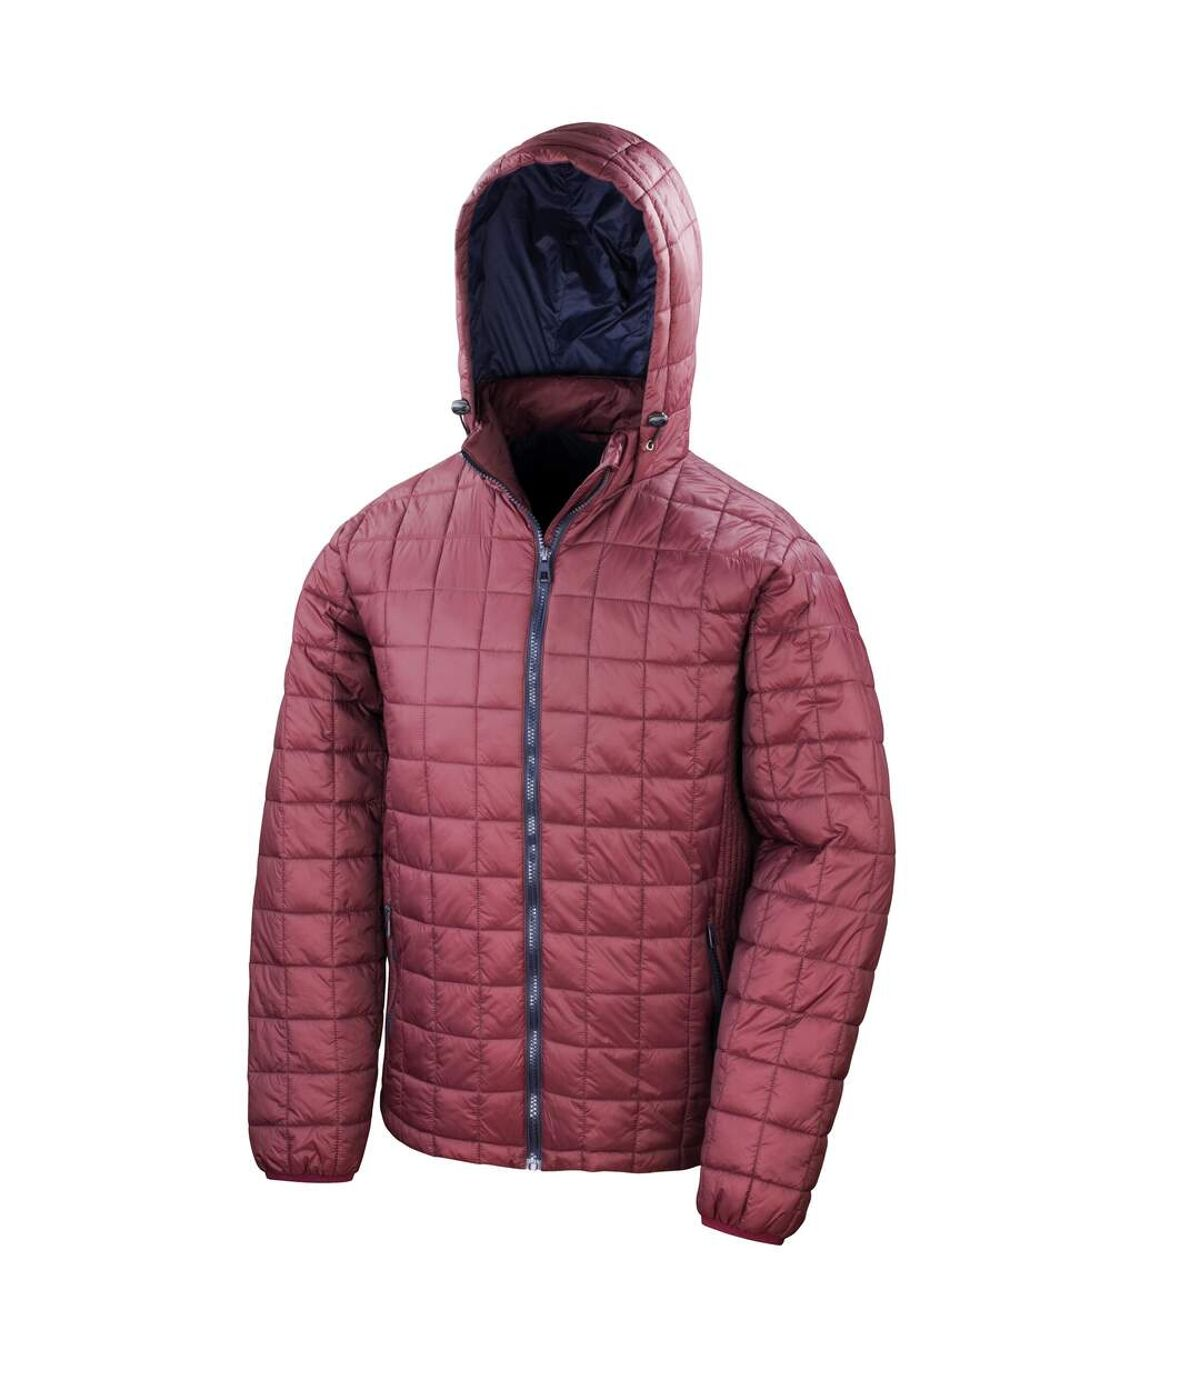 Result Adults Unisex Urban Outdoor Blizzard Jacket (Ruby/Navy) - UTRW5159